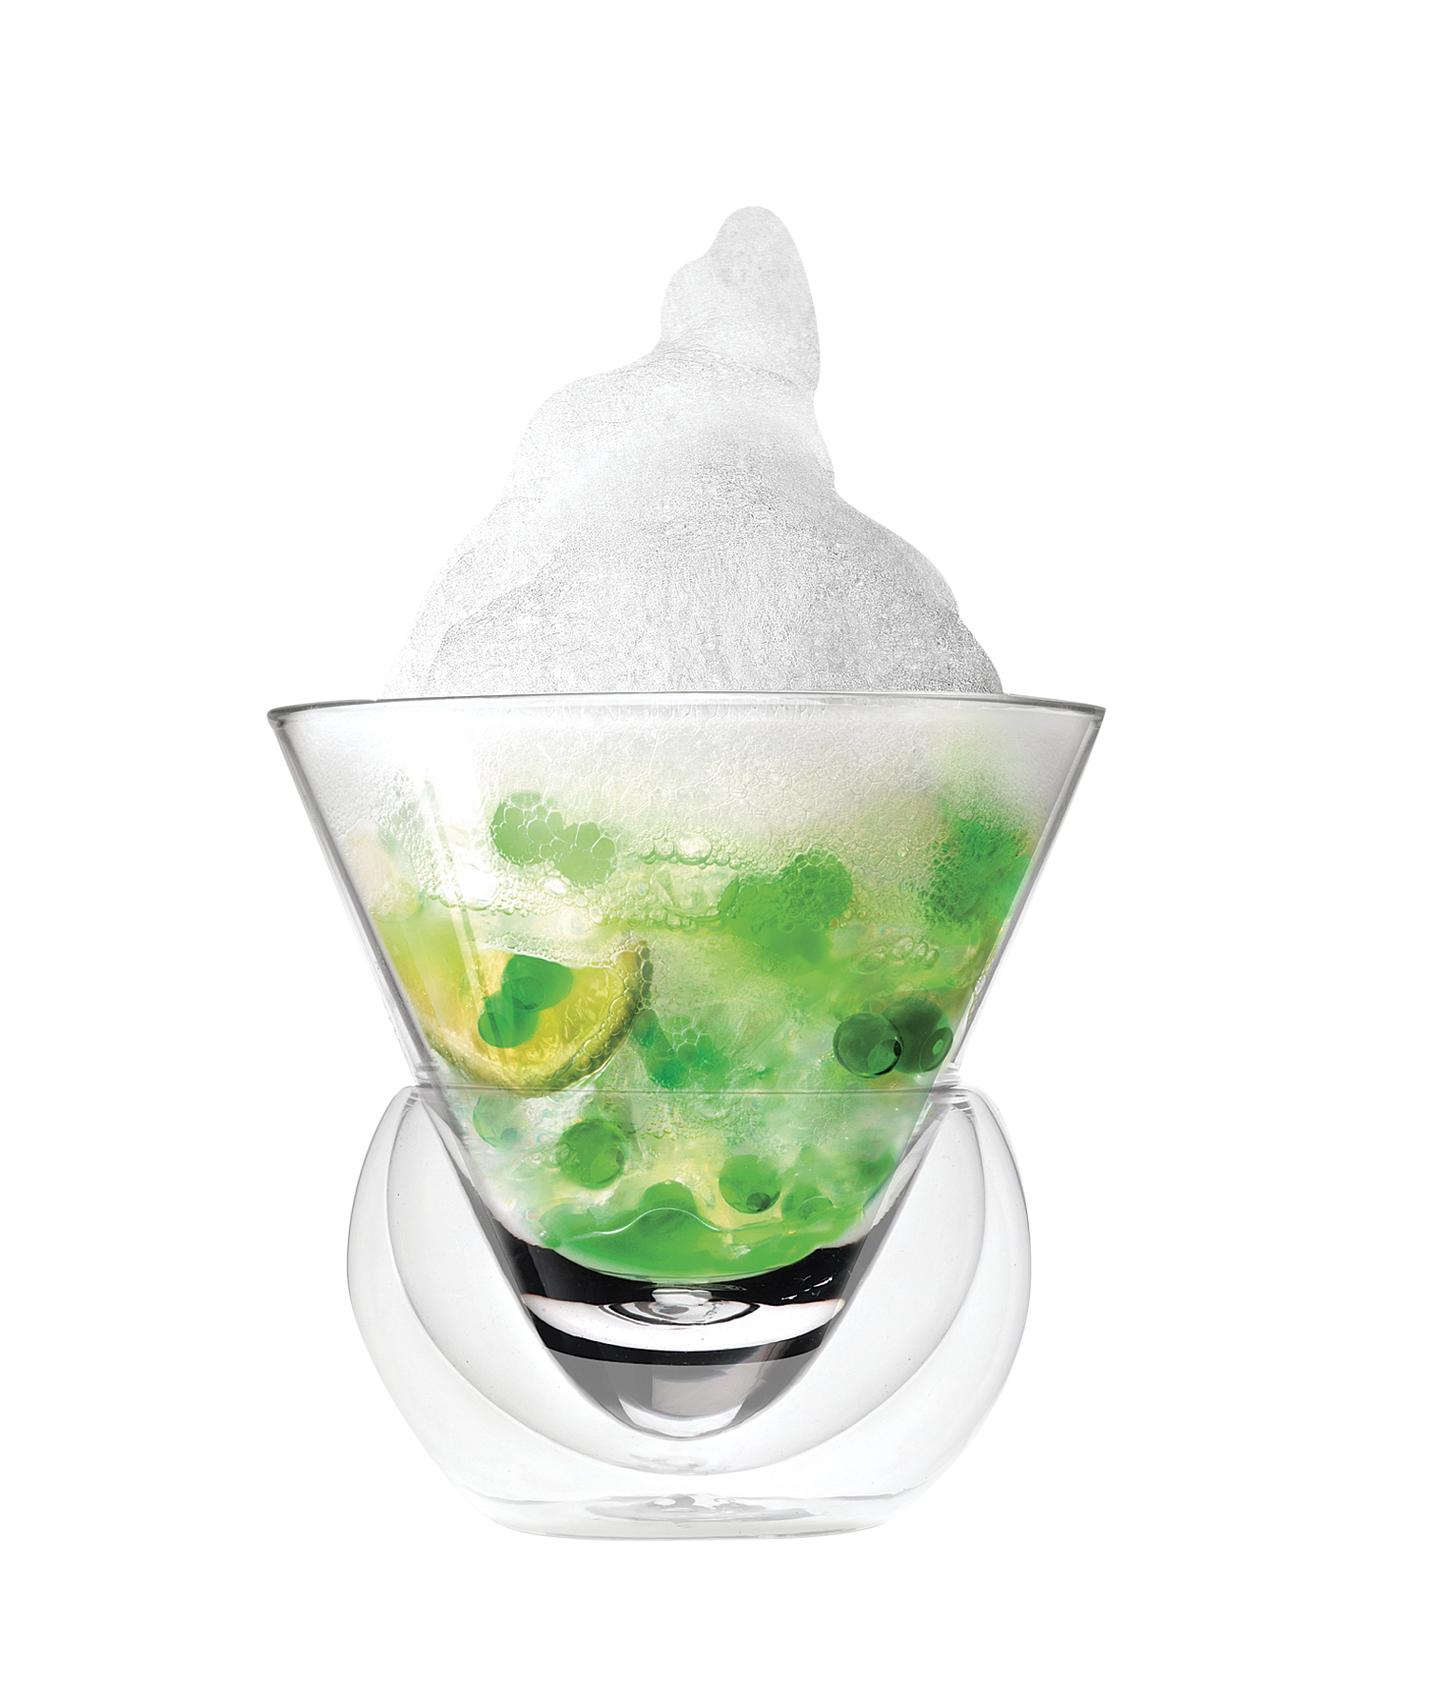 Kit cocktail mojito mol culaire kit mixologie r evolution super insolite - Cocktail cuisine moleculaire ...